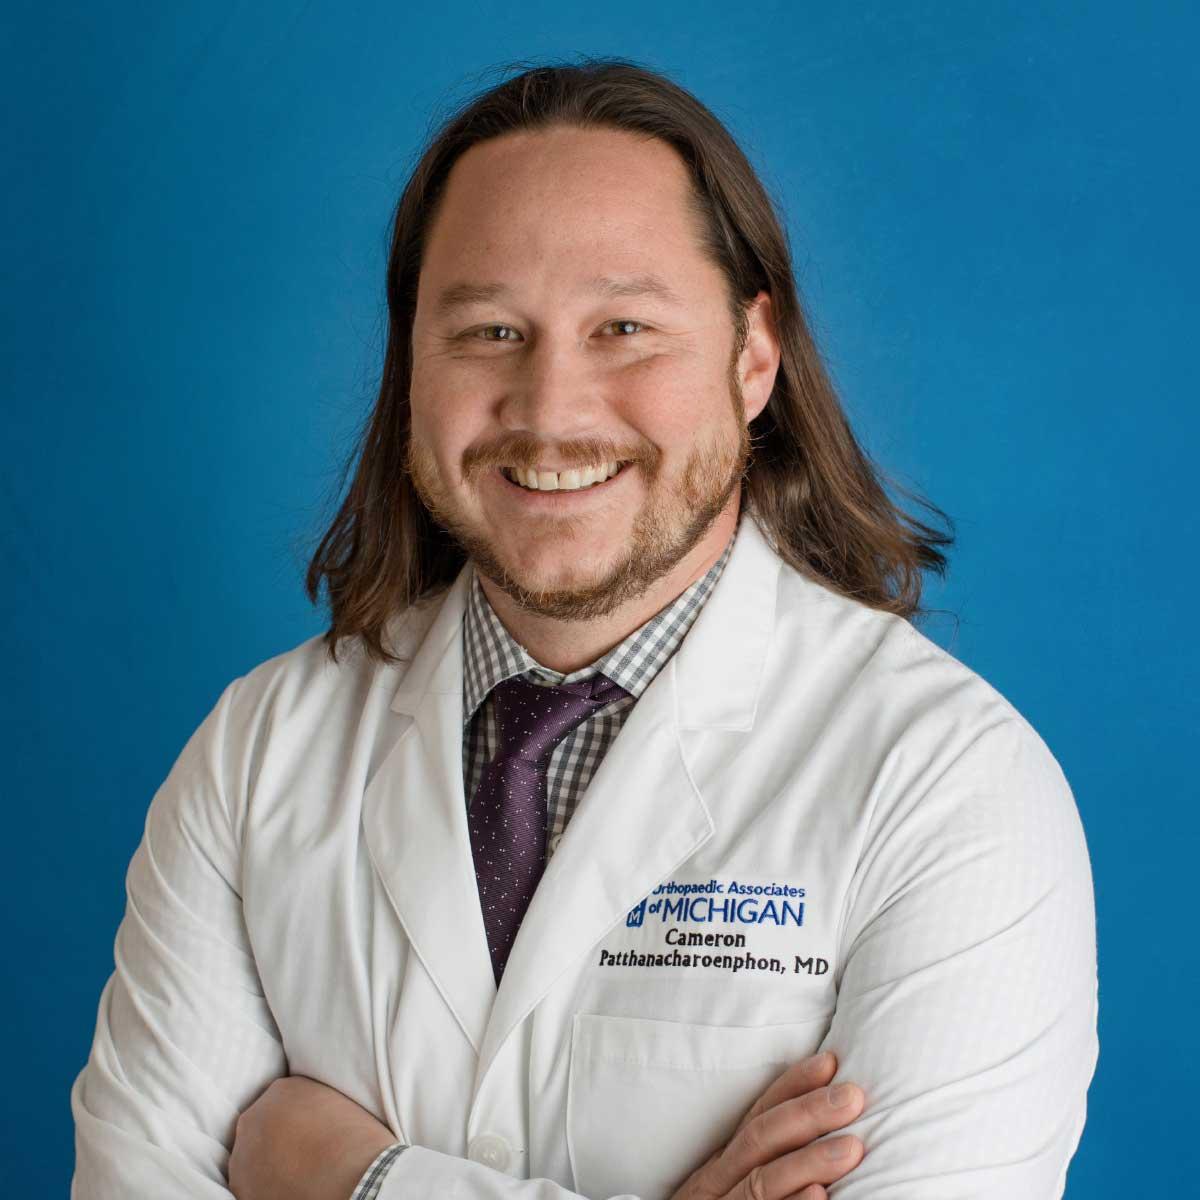 Cameron Patthanacharoenphon, MD